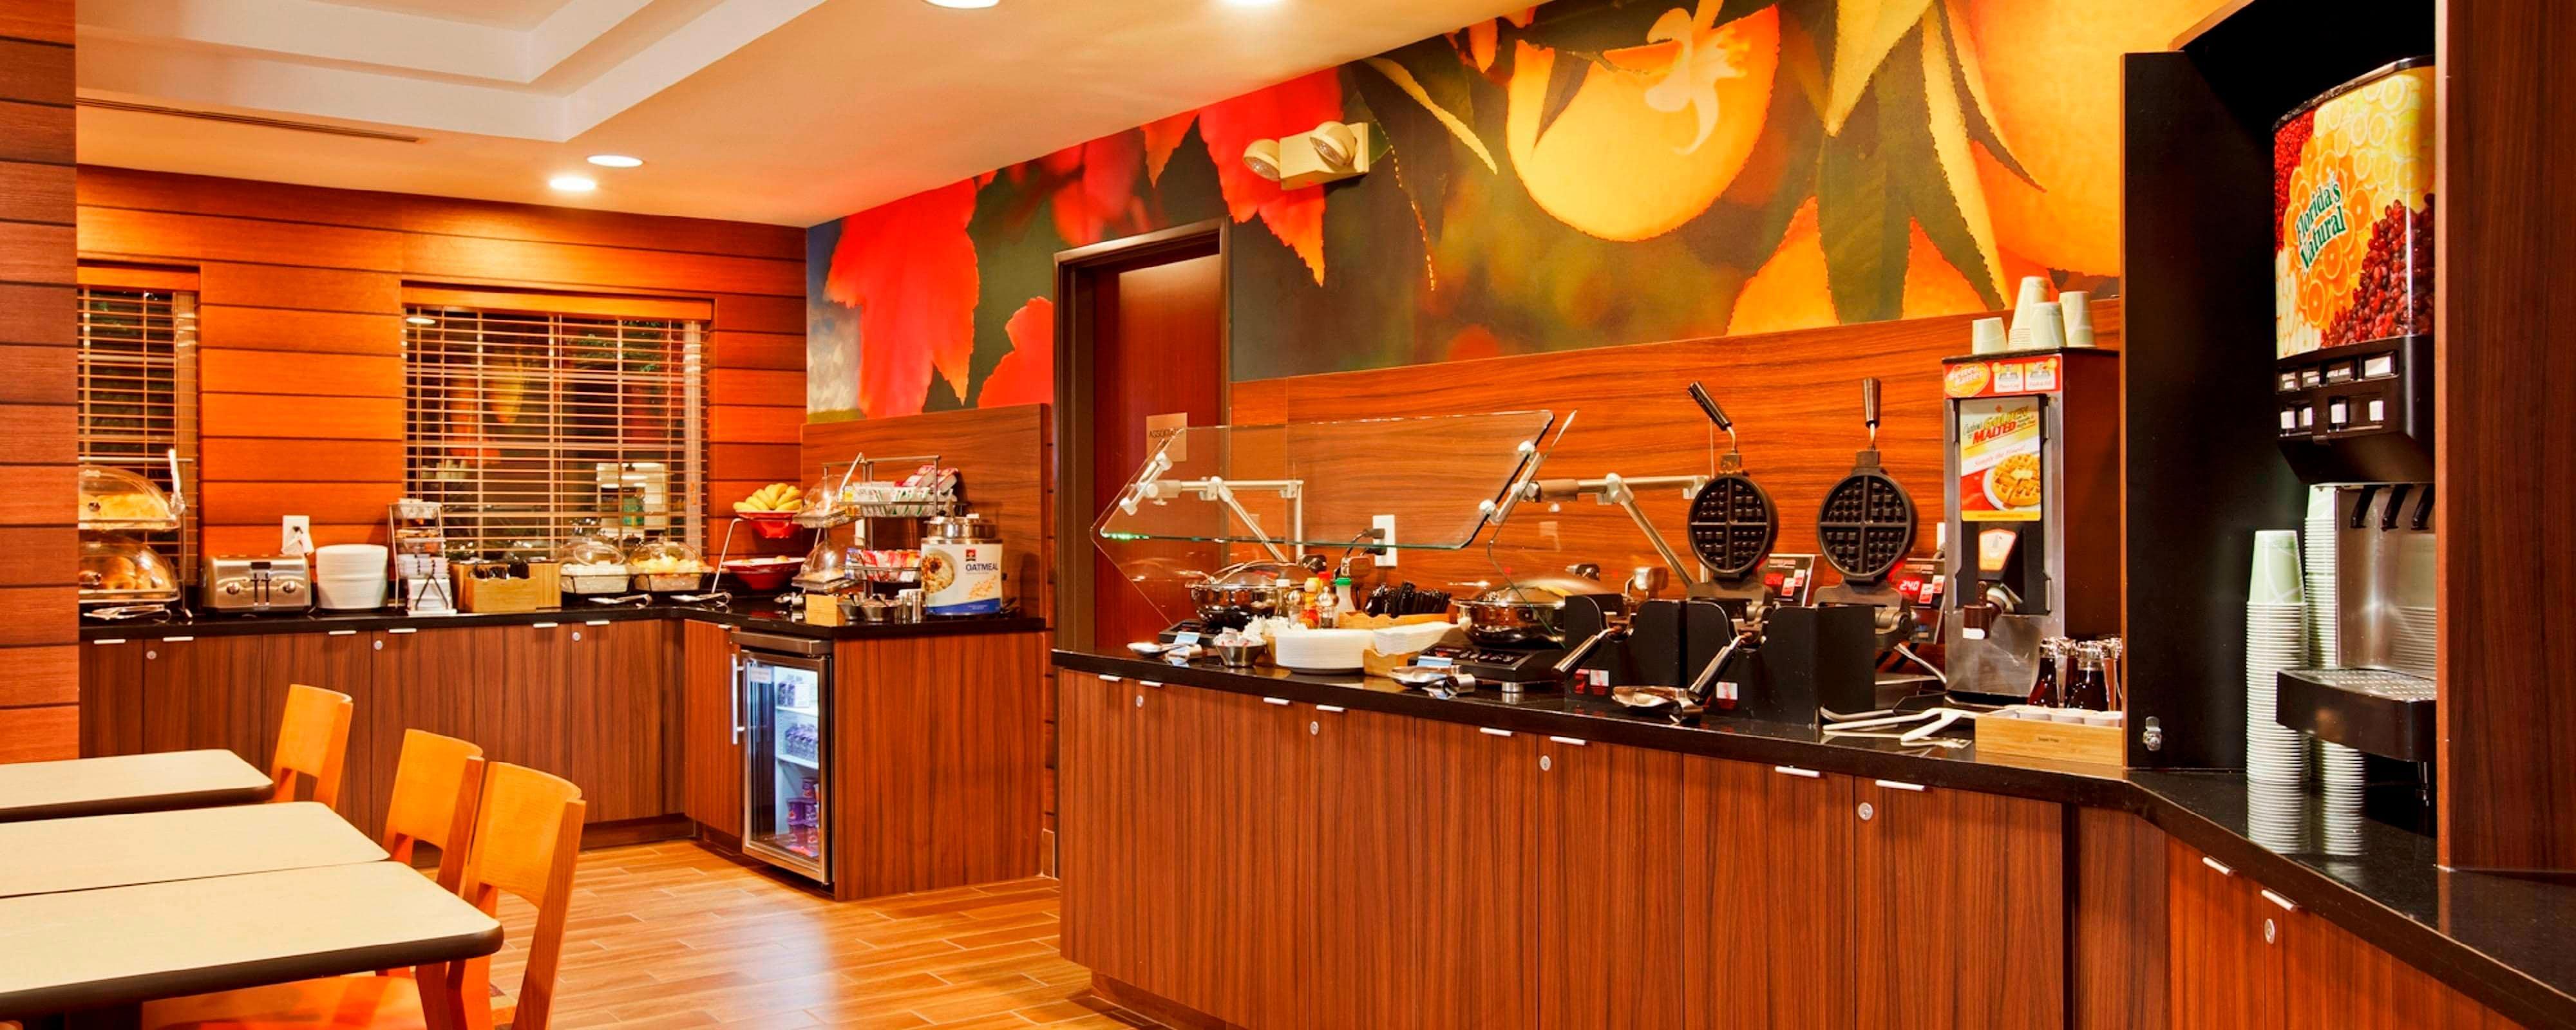 Lake Oswego hotel restaurants | Fairfield Inn & Suites Portland ...